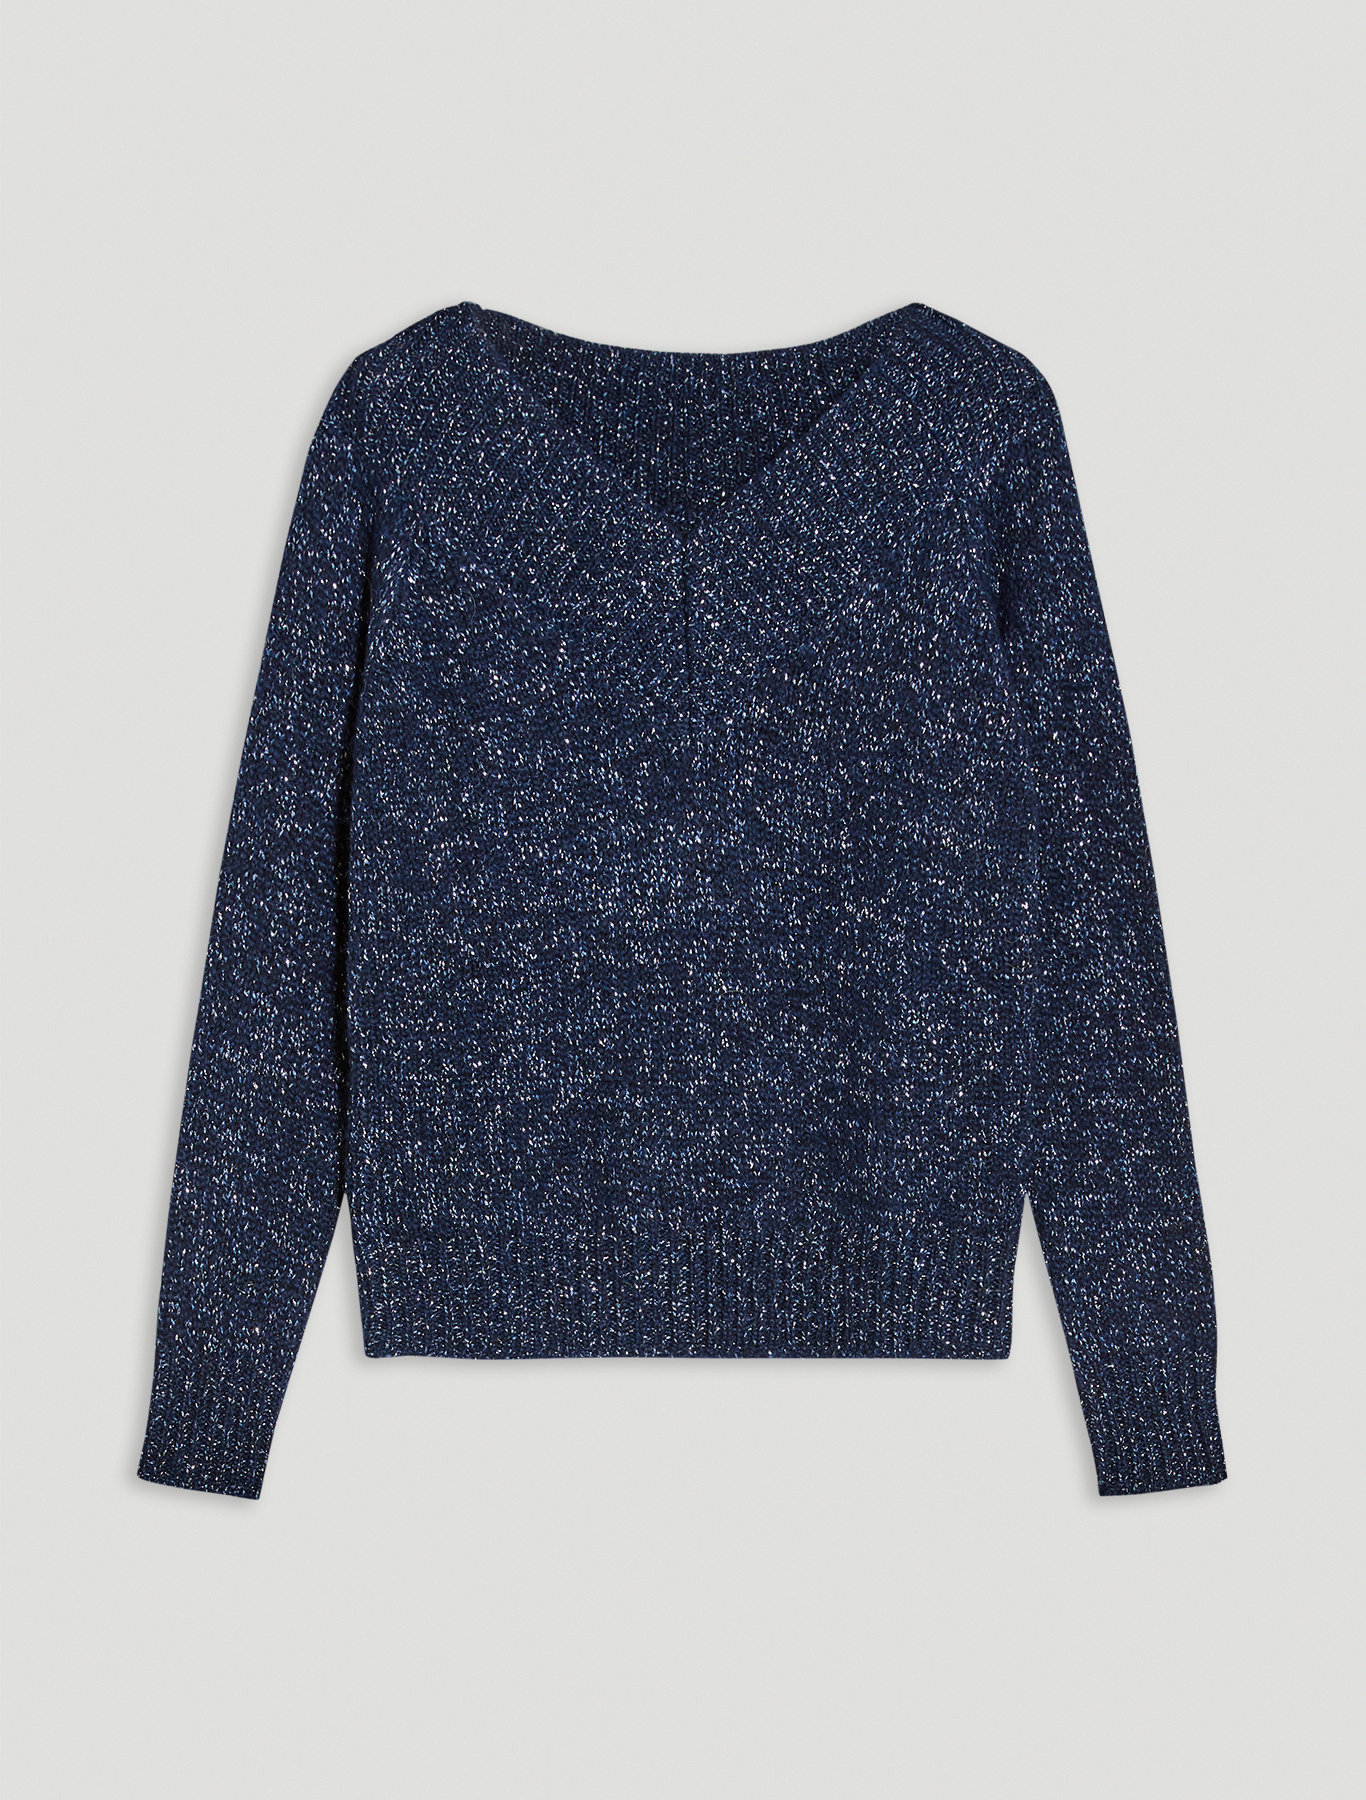 Pullover in a lamé alpaca blend - navy blue - pennyblack